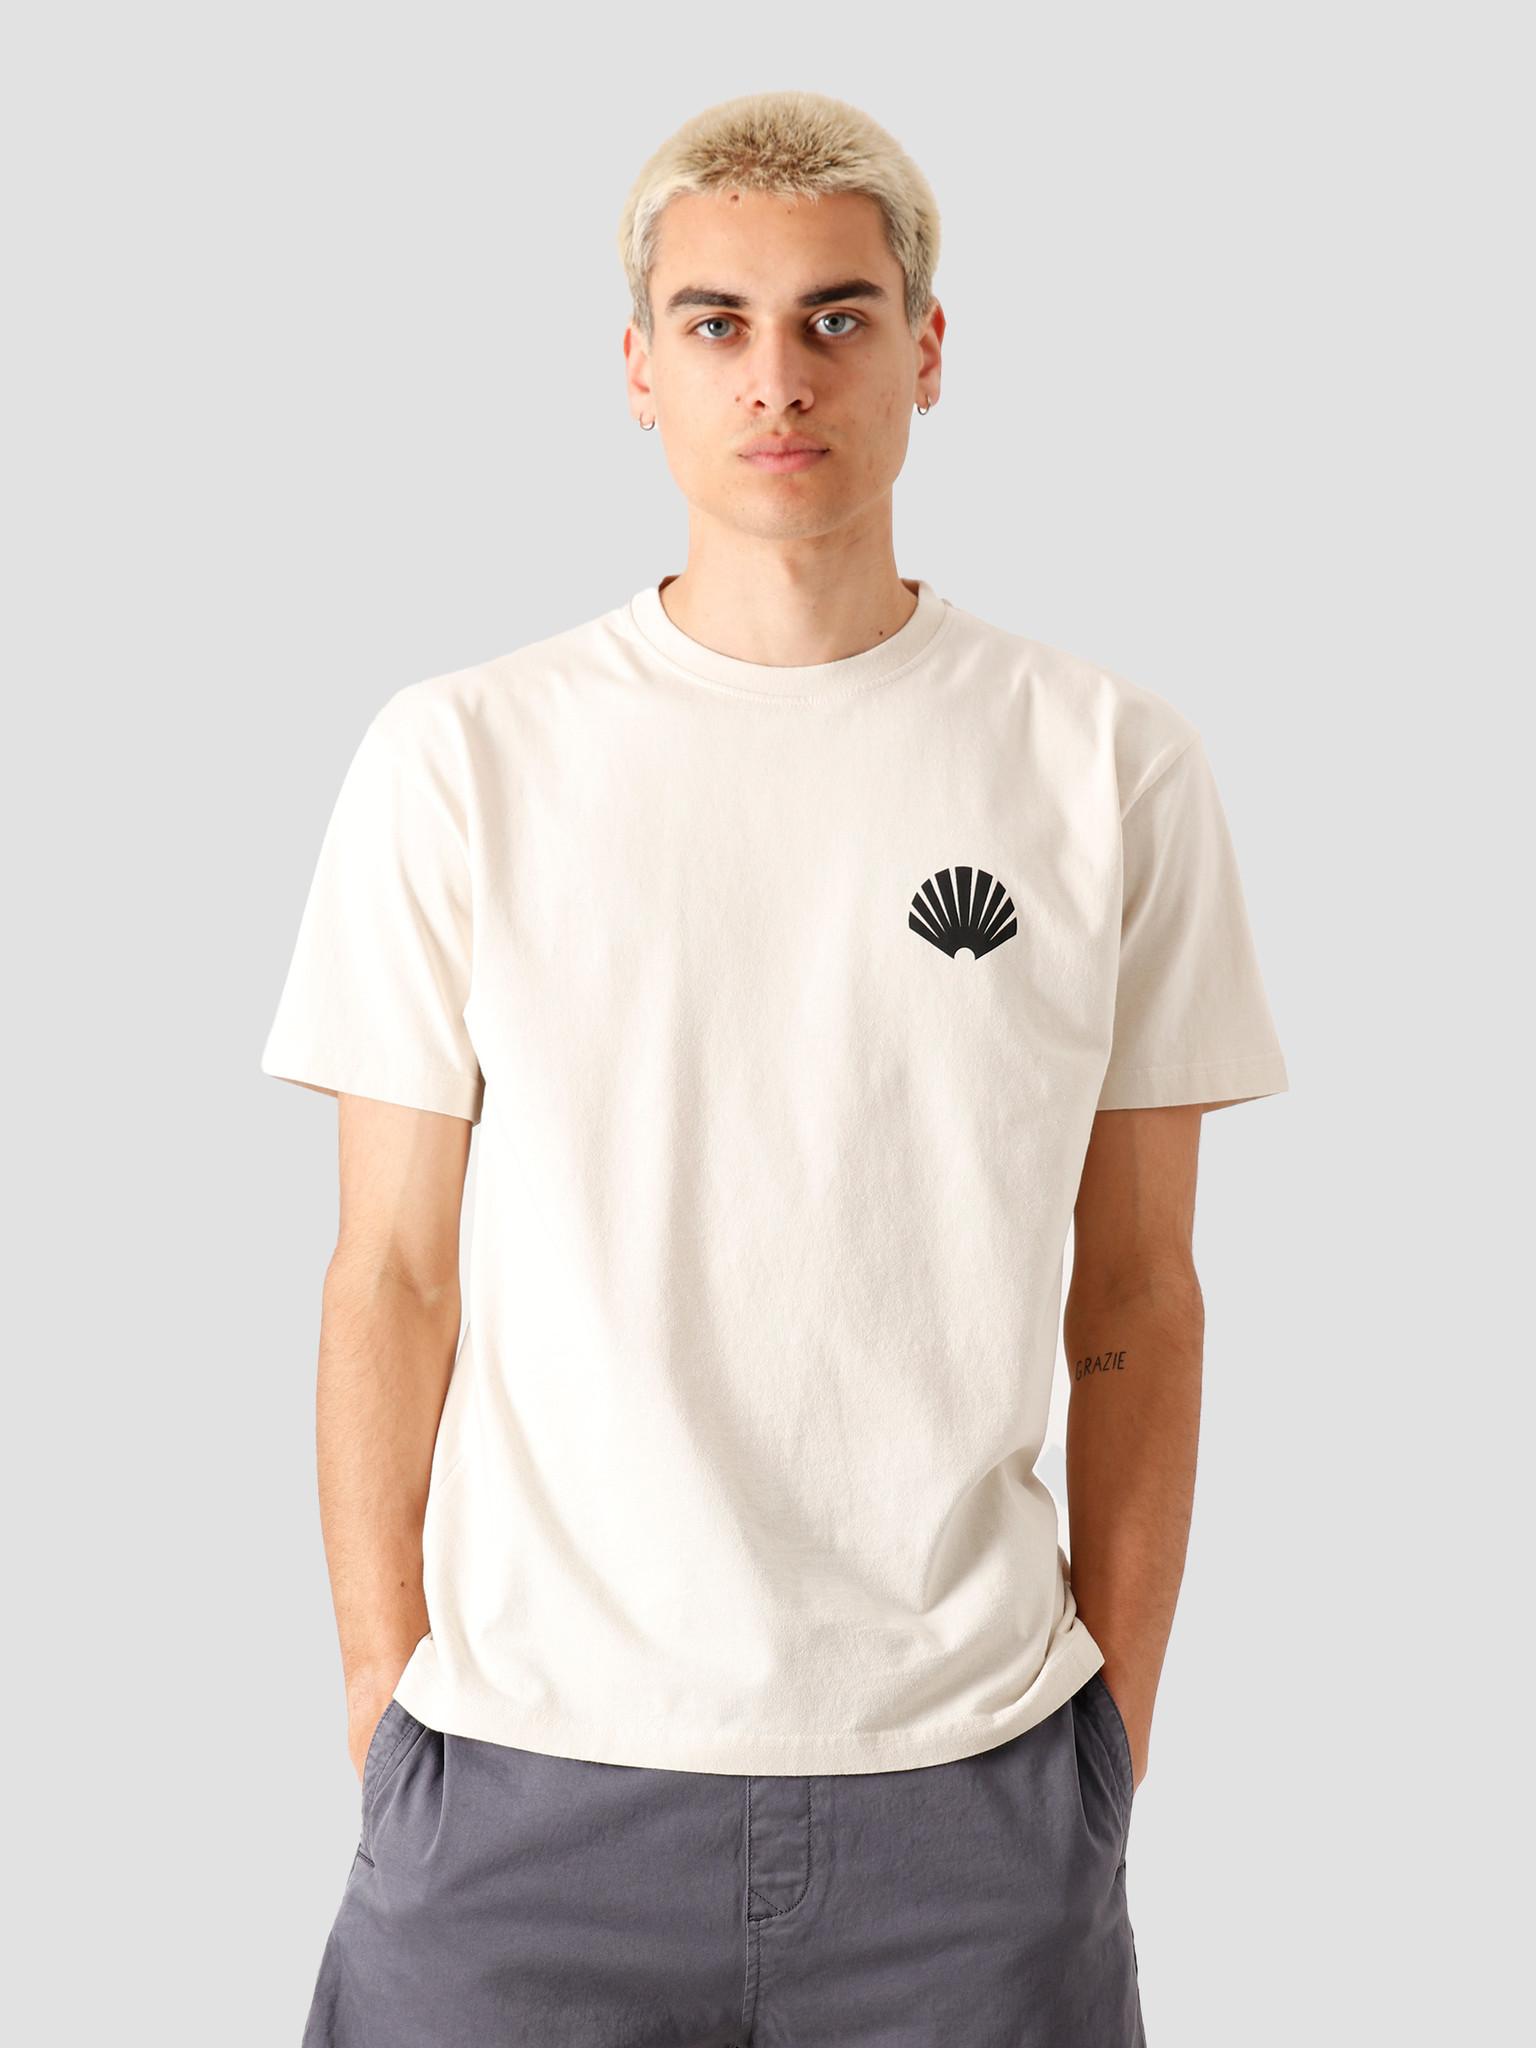 New Amsterdam Surf association New Amsterdam Surf association Logo T-Shirt Off White 2020001